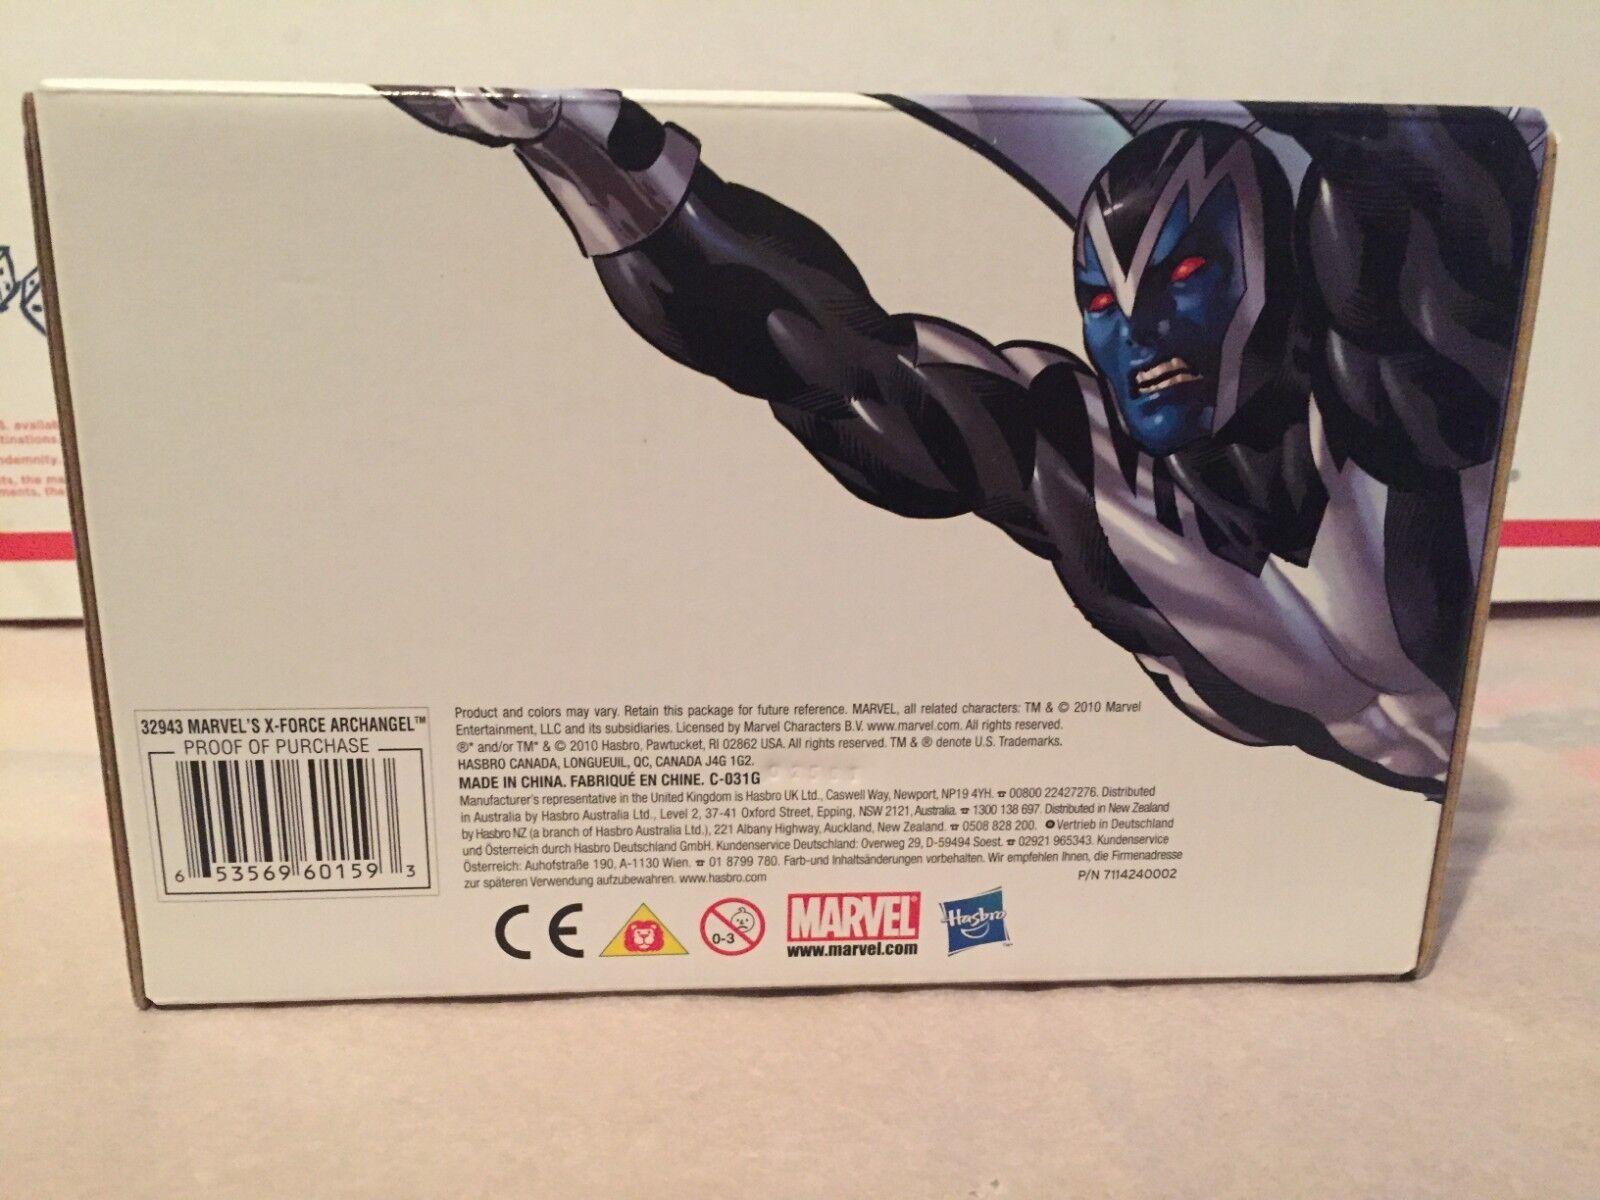 Hasbro 2010 nycc exklusive marvel - universum x - force erzengel variante misb